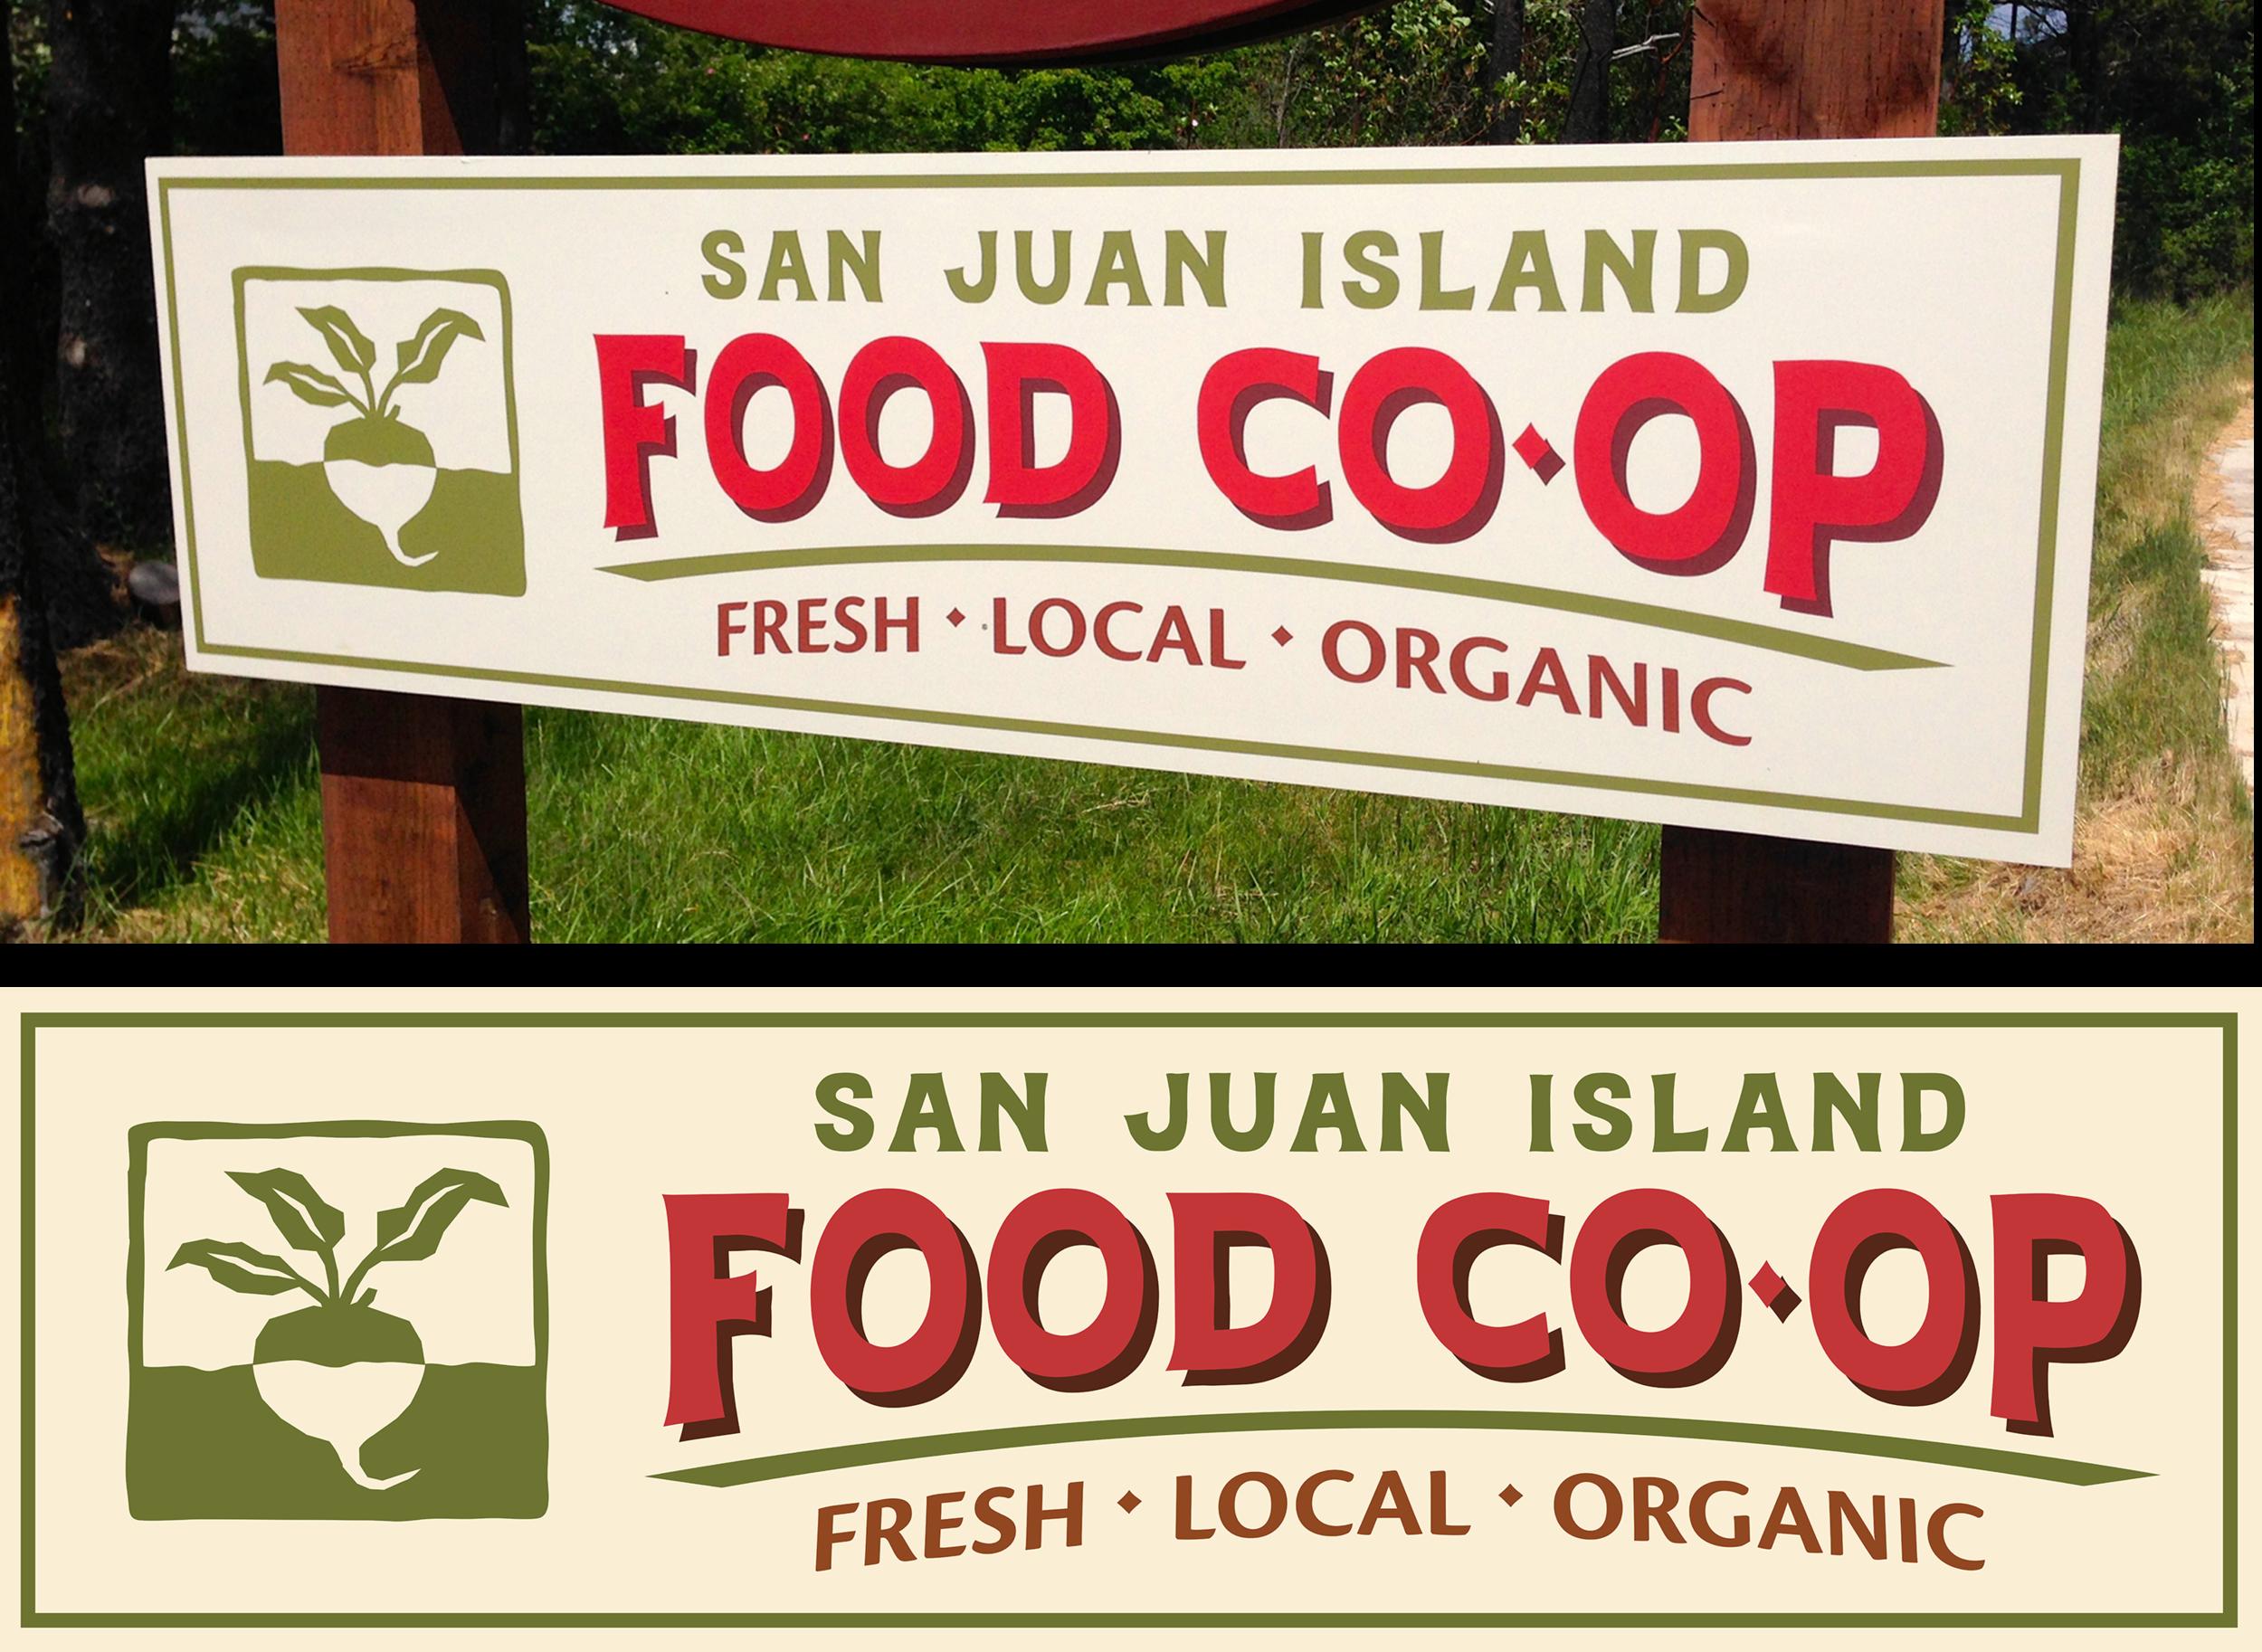 San Juan Island Food Co-op